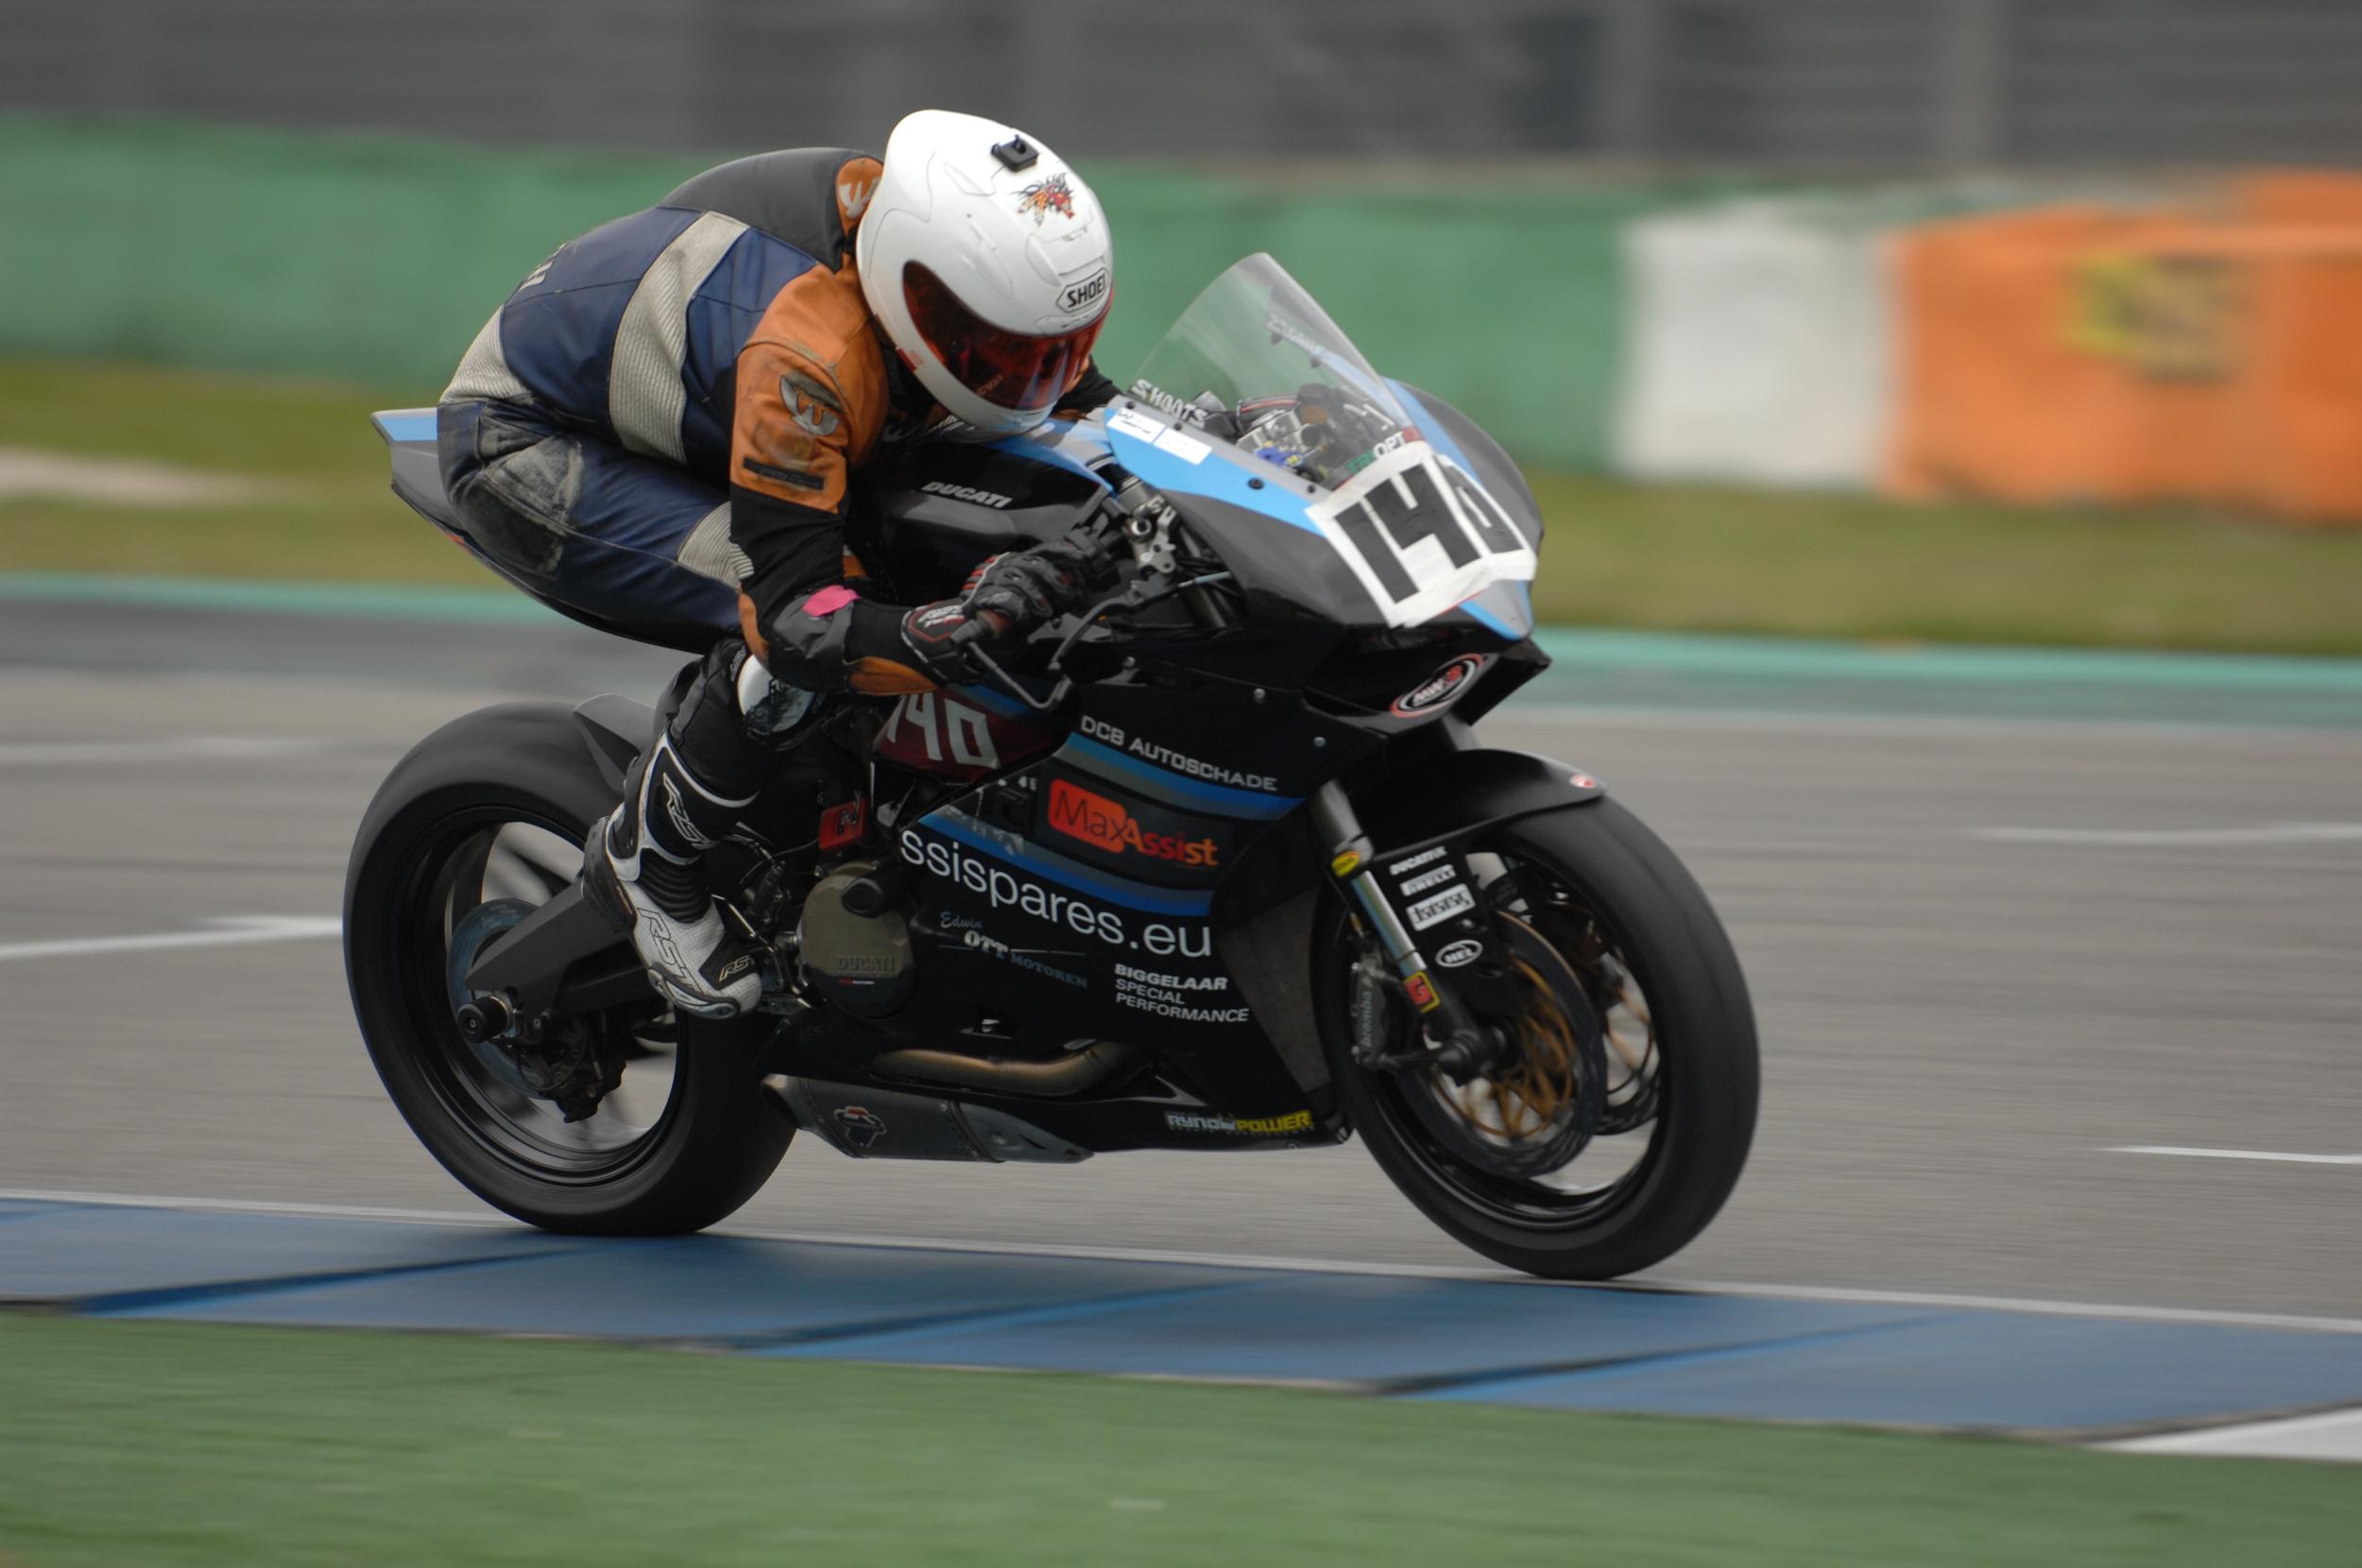 A great shot by Ad Kievit of  wegraceinfo.nl , exit GT chicane at Assen.